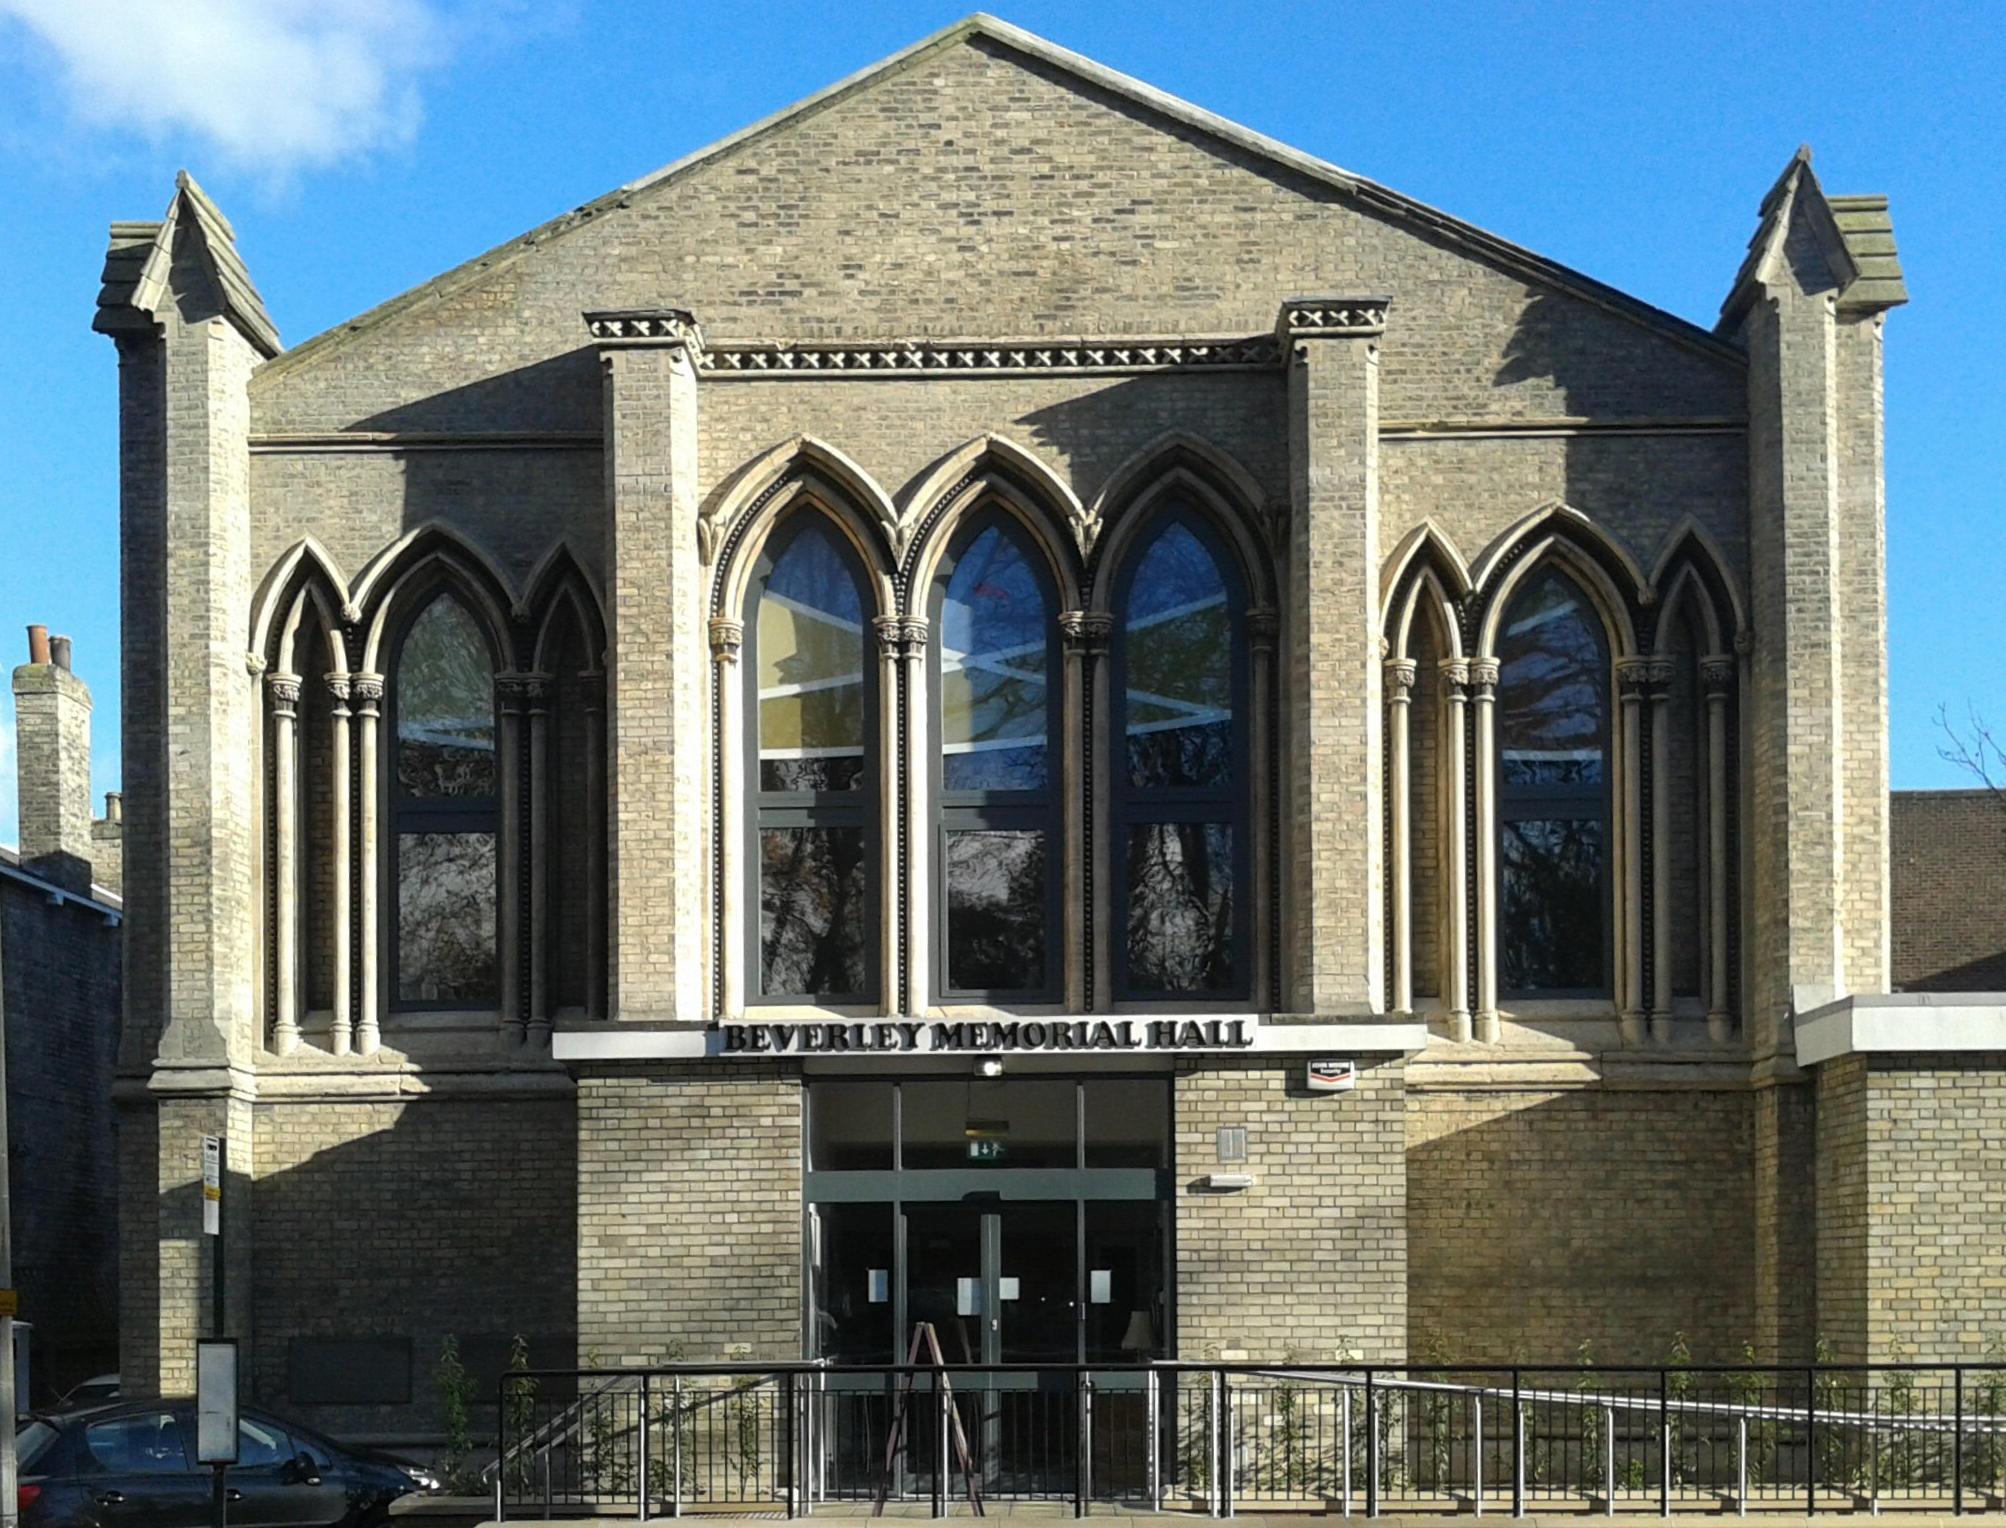 Beverley Memorial Hall